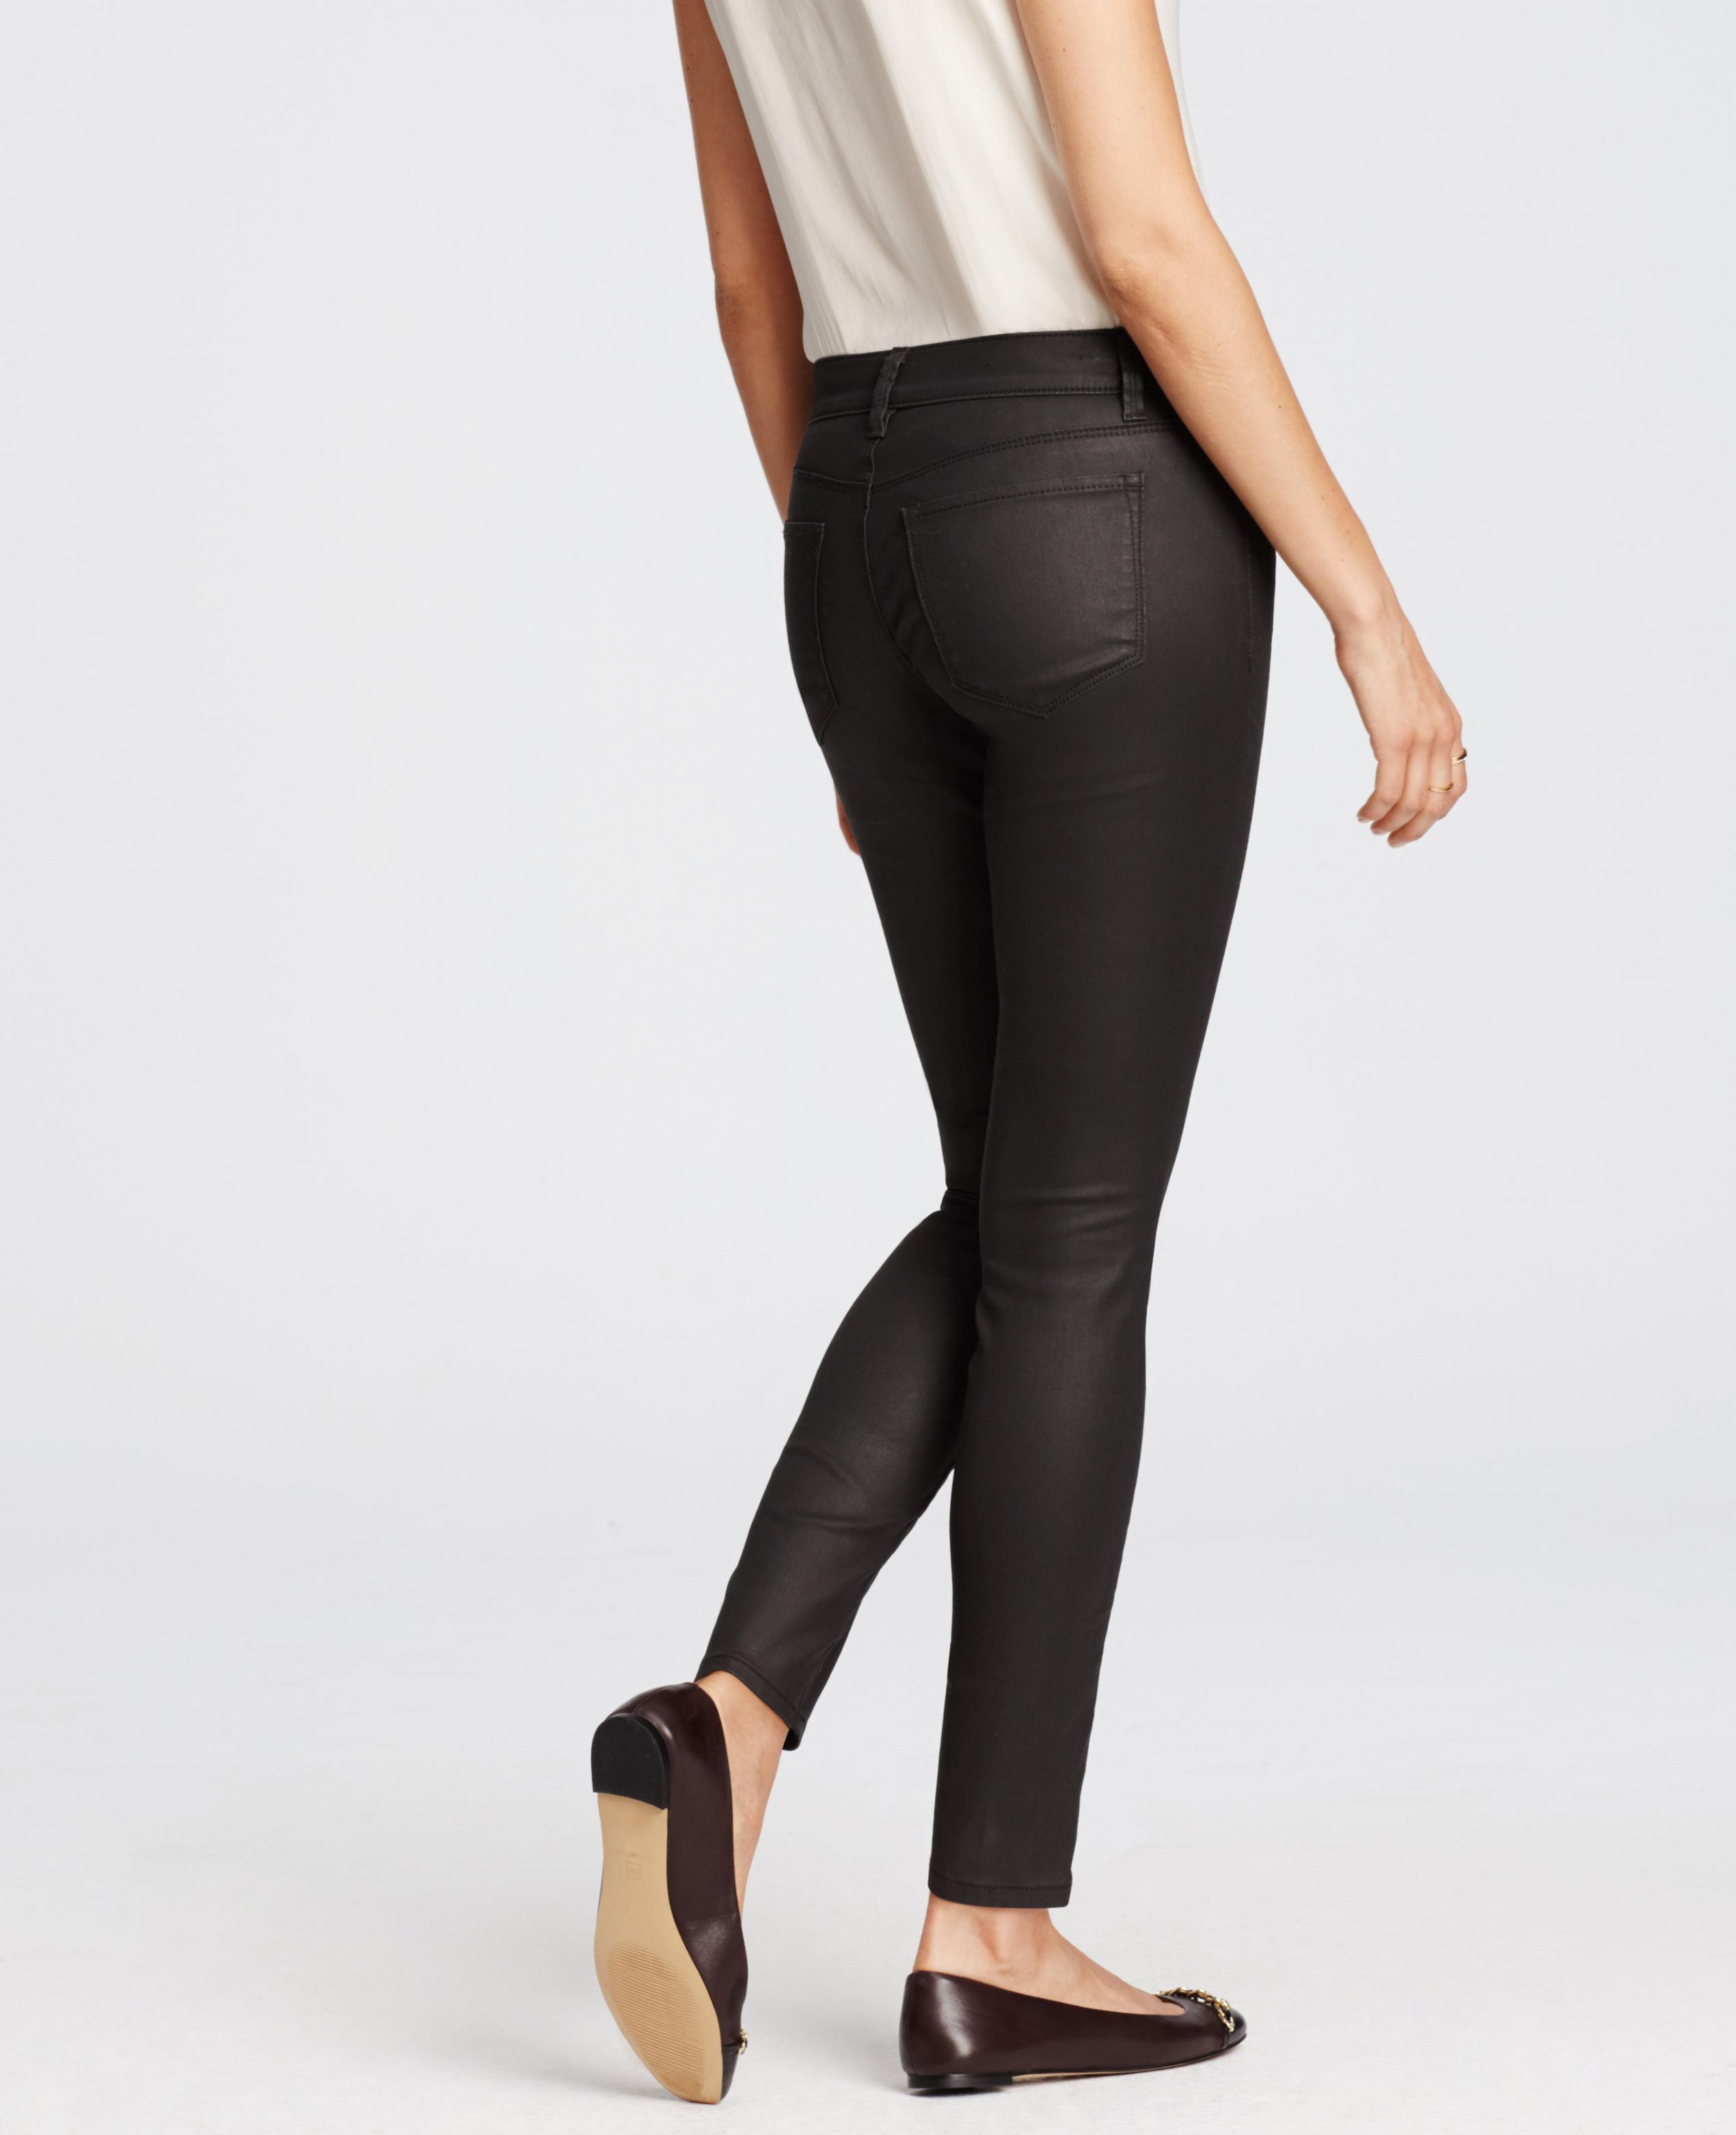 9ea9dddf86 Ann Taylor Modern Coated Super Skinny Jeans in Gray - Lyst